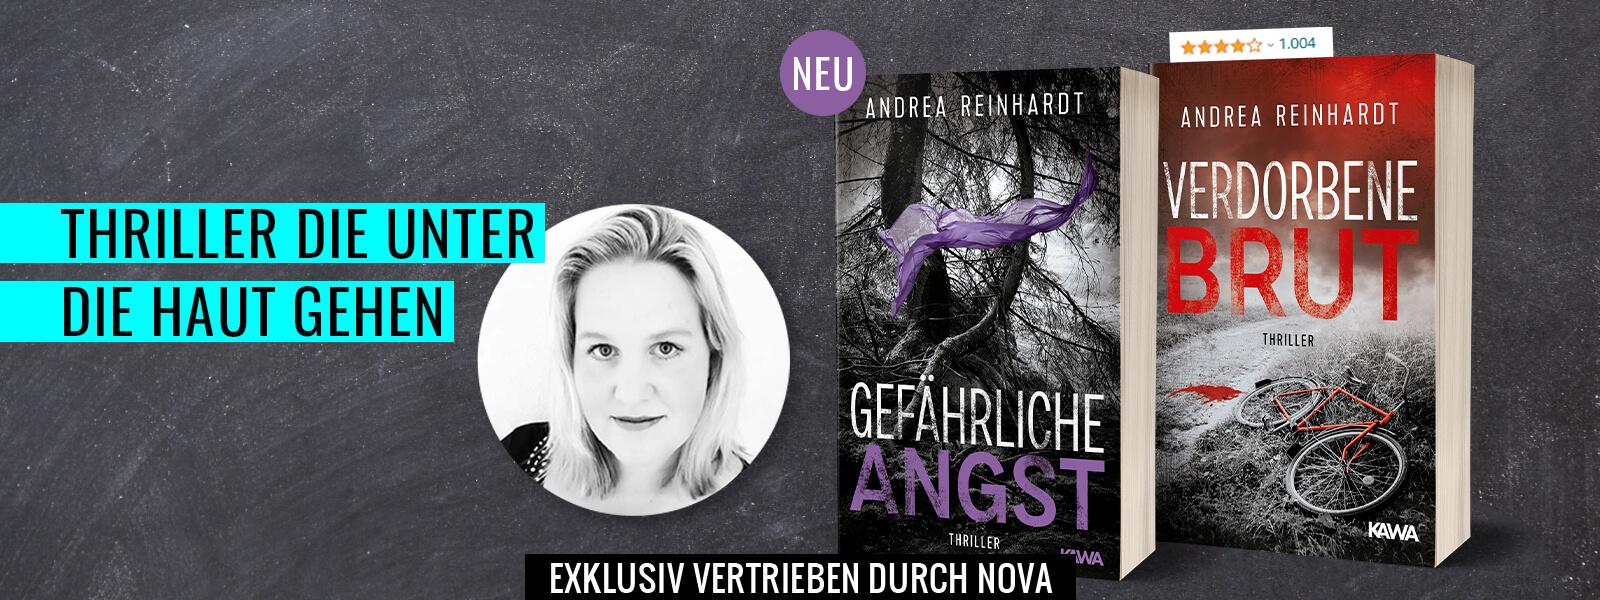 Bestseller-Autorin Andrea Reinhardt Thriller